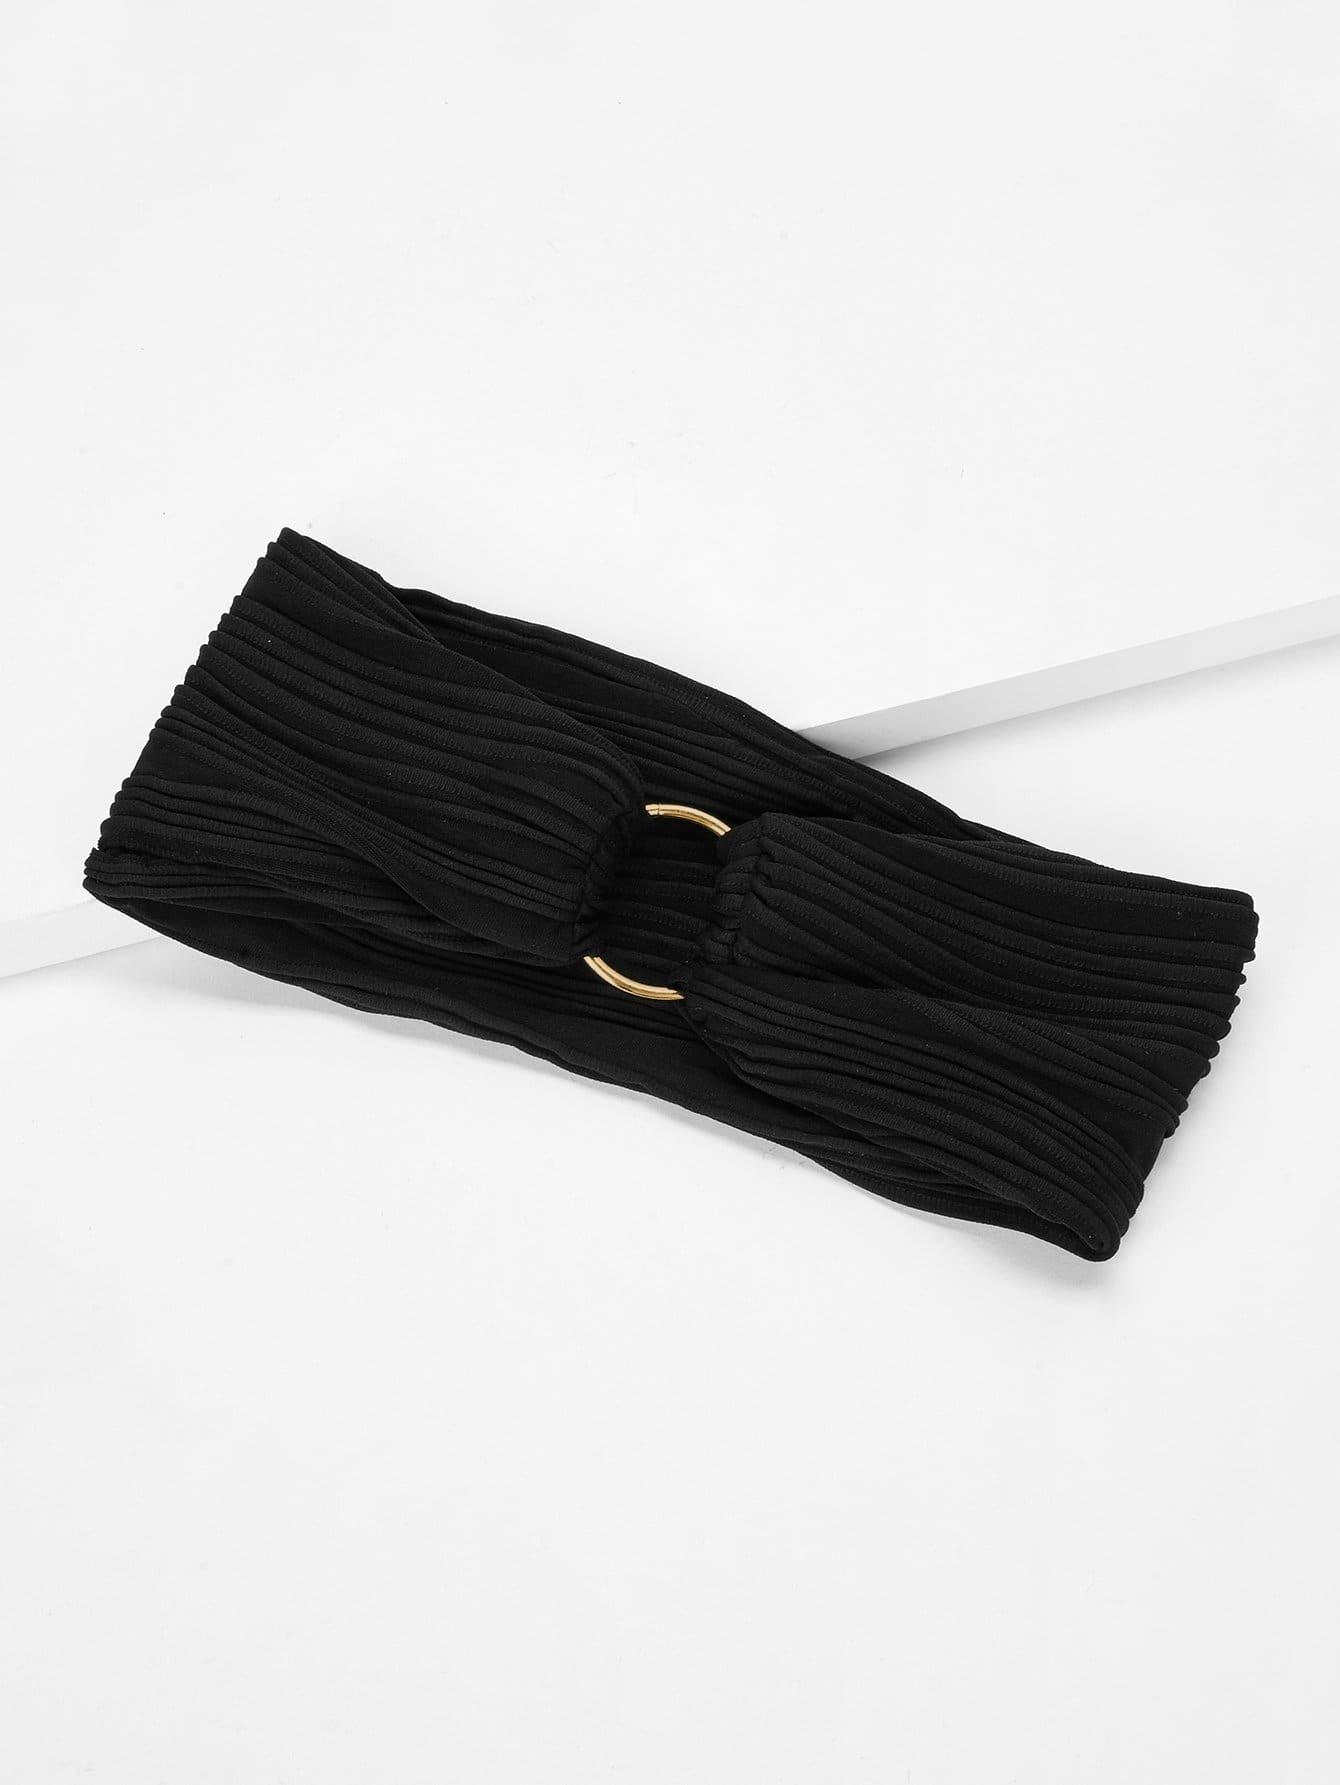 Купить Кольцо украшено повязка на голову, null, SheIn